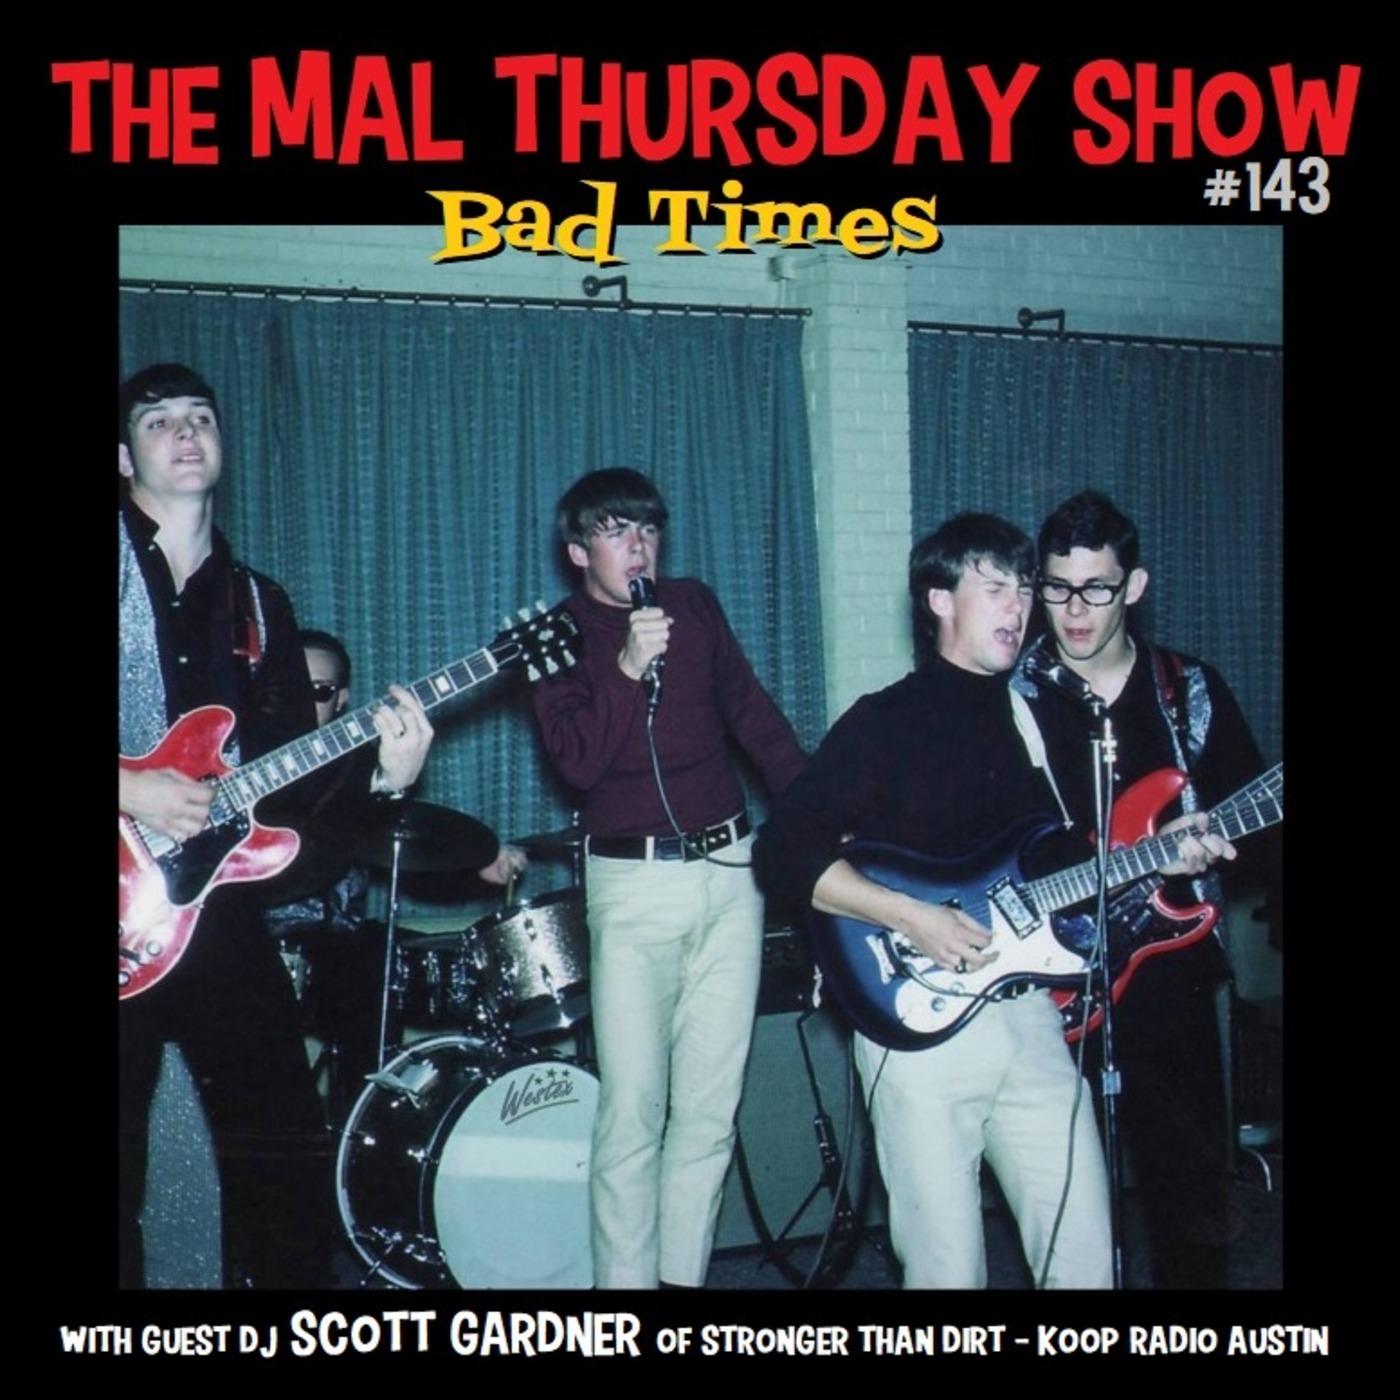 The Mal Thursday Show